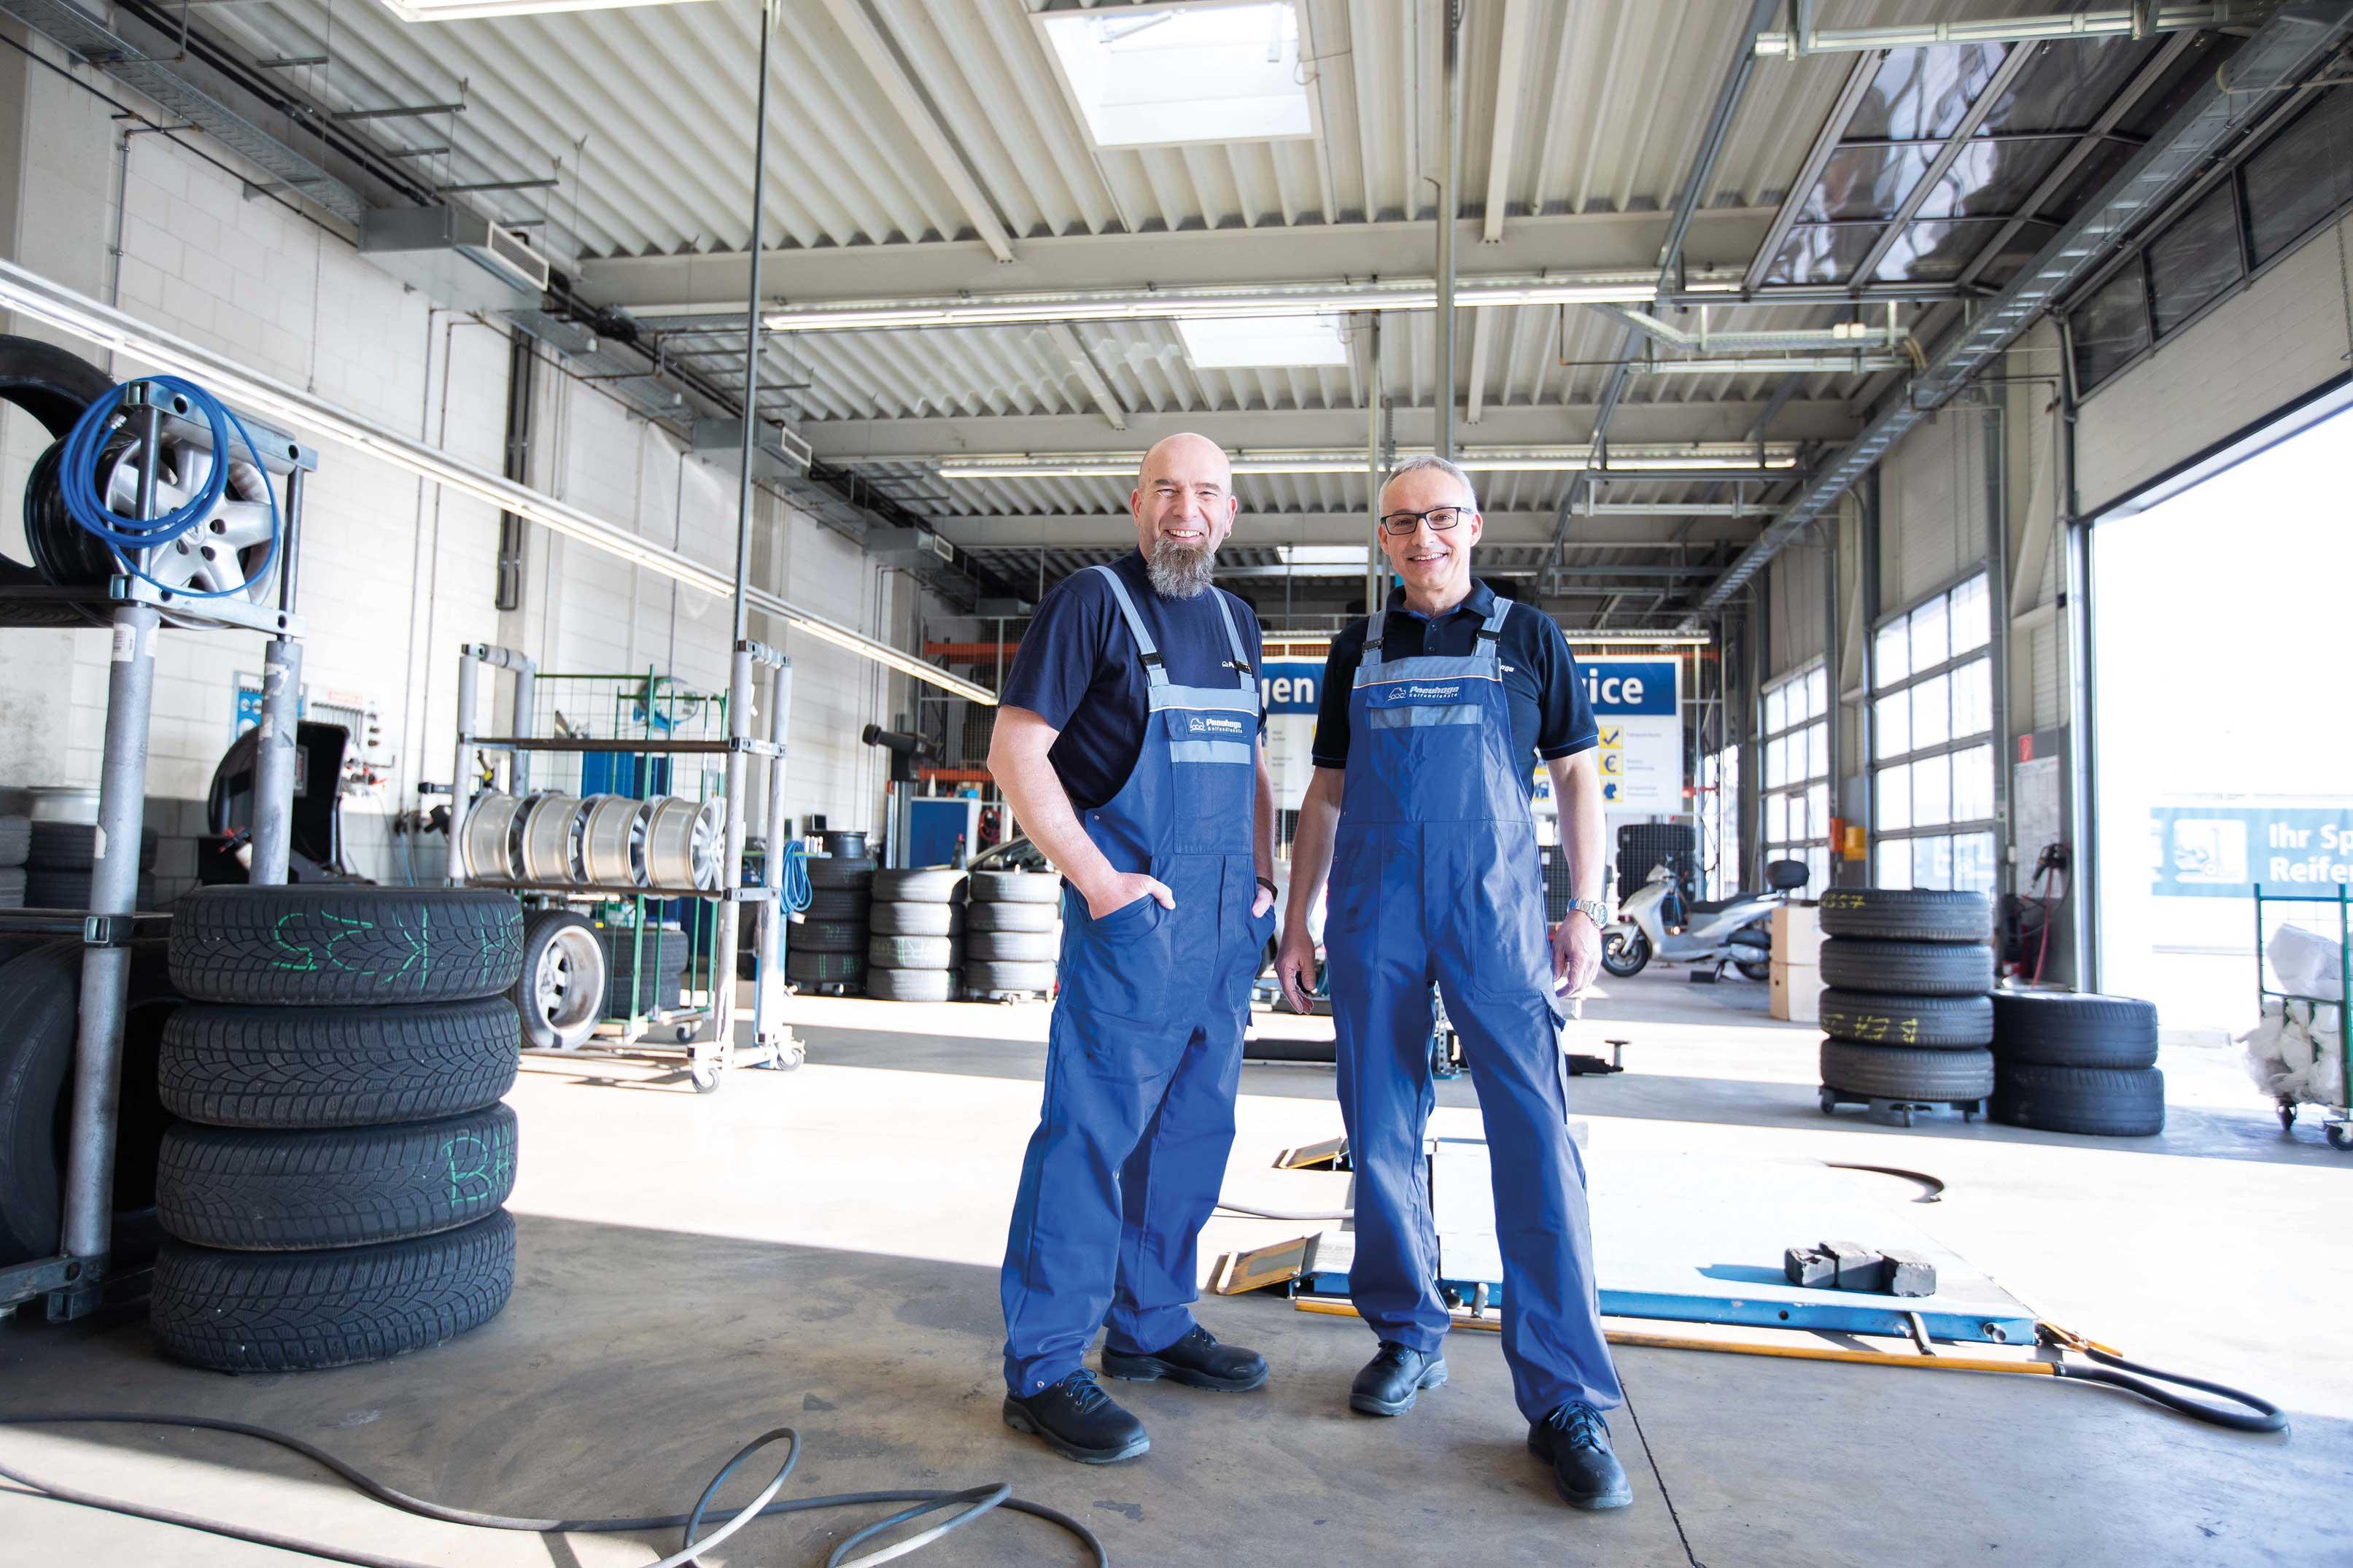 Reifenmonteur (m/w/d) als Saisonaushilfe